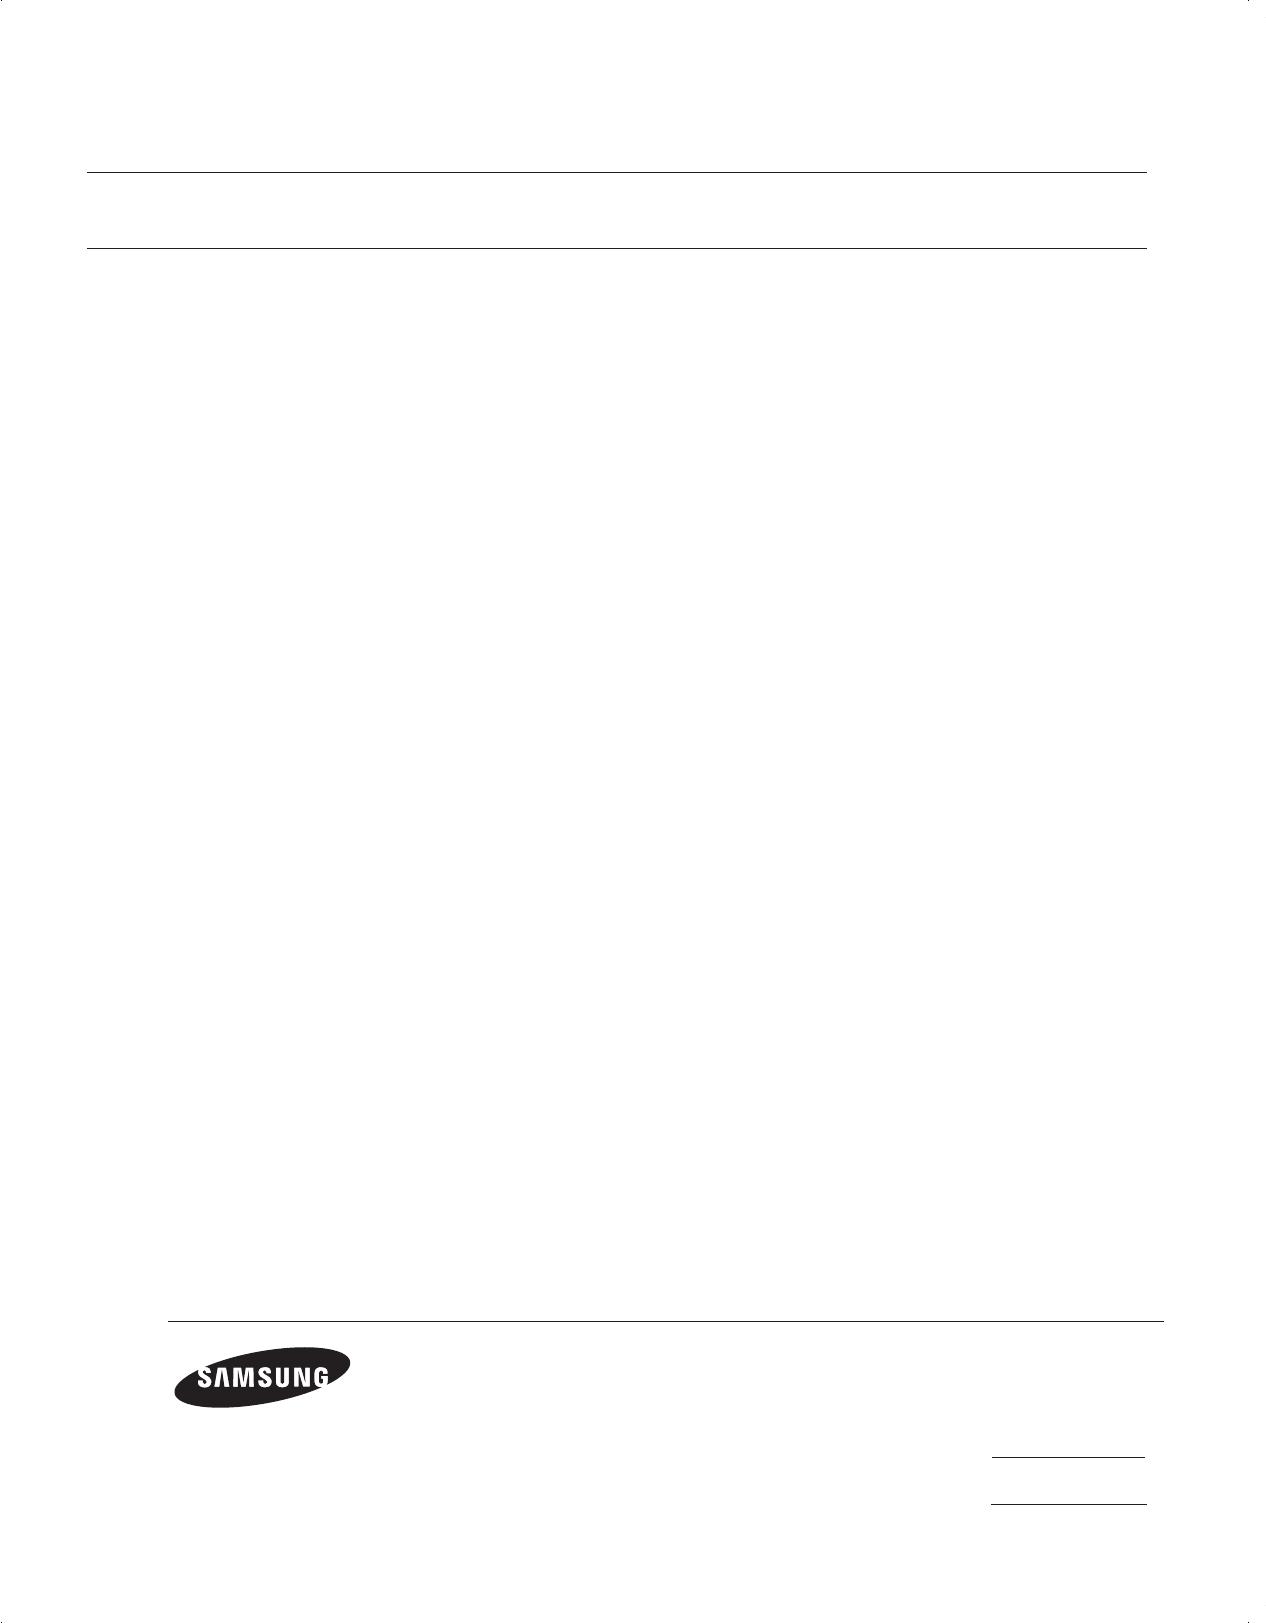 Samsung Rfg298Aars Users Manual